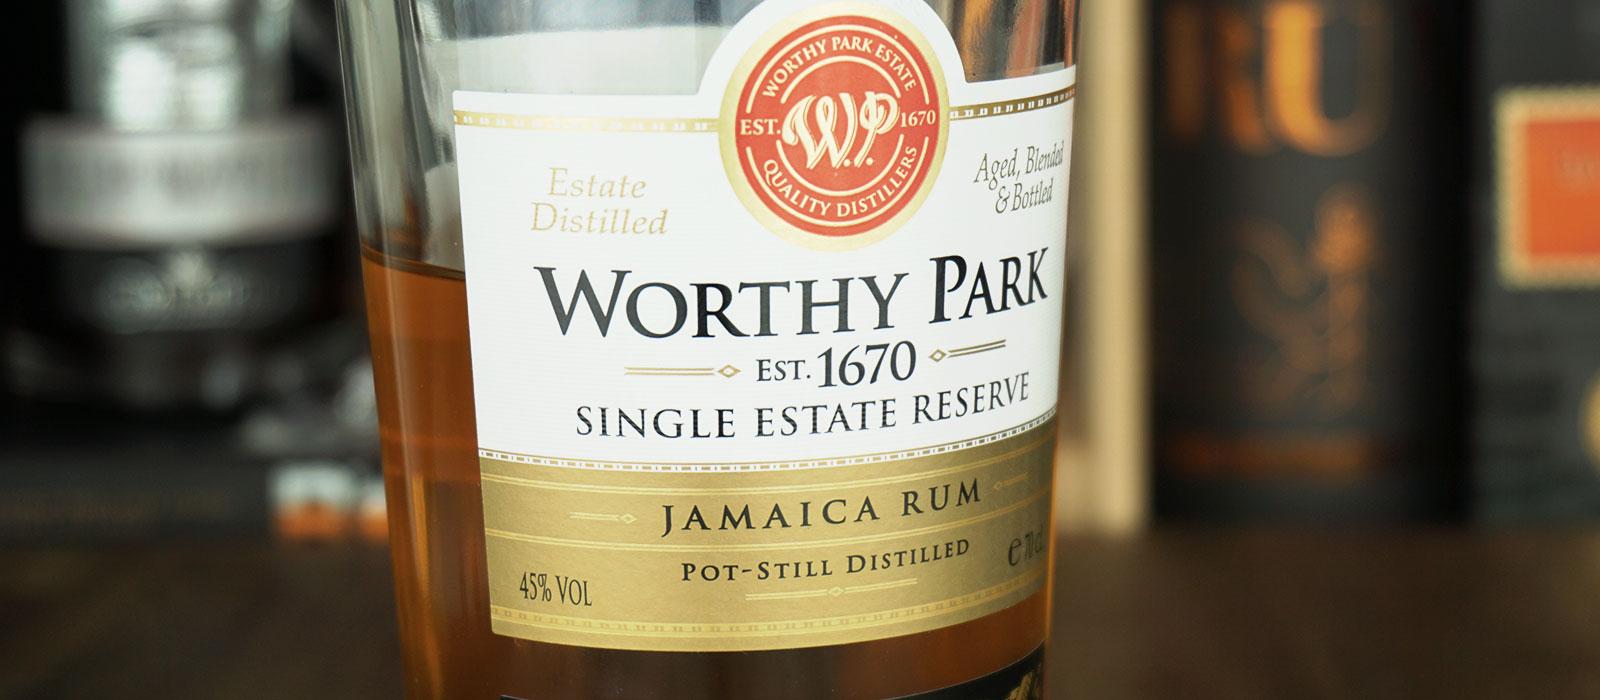 Åttonde plats 2019: Worthy Park Single Estate Reserve